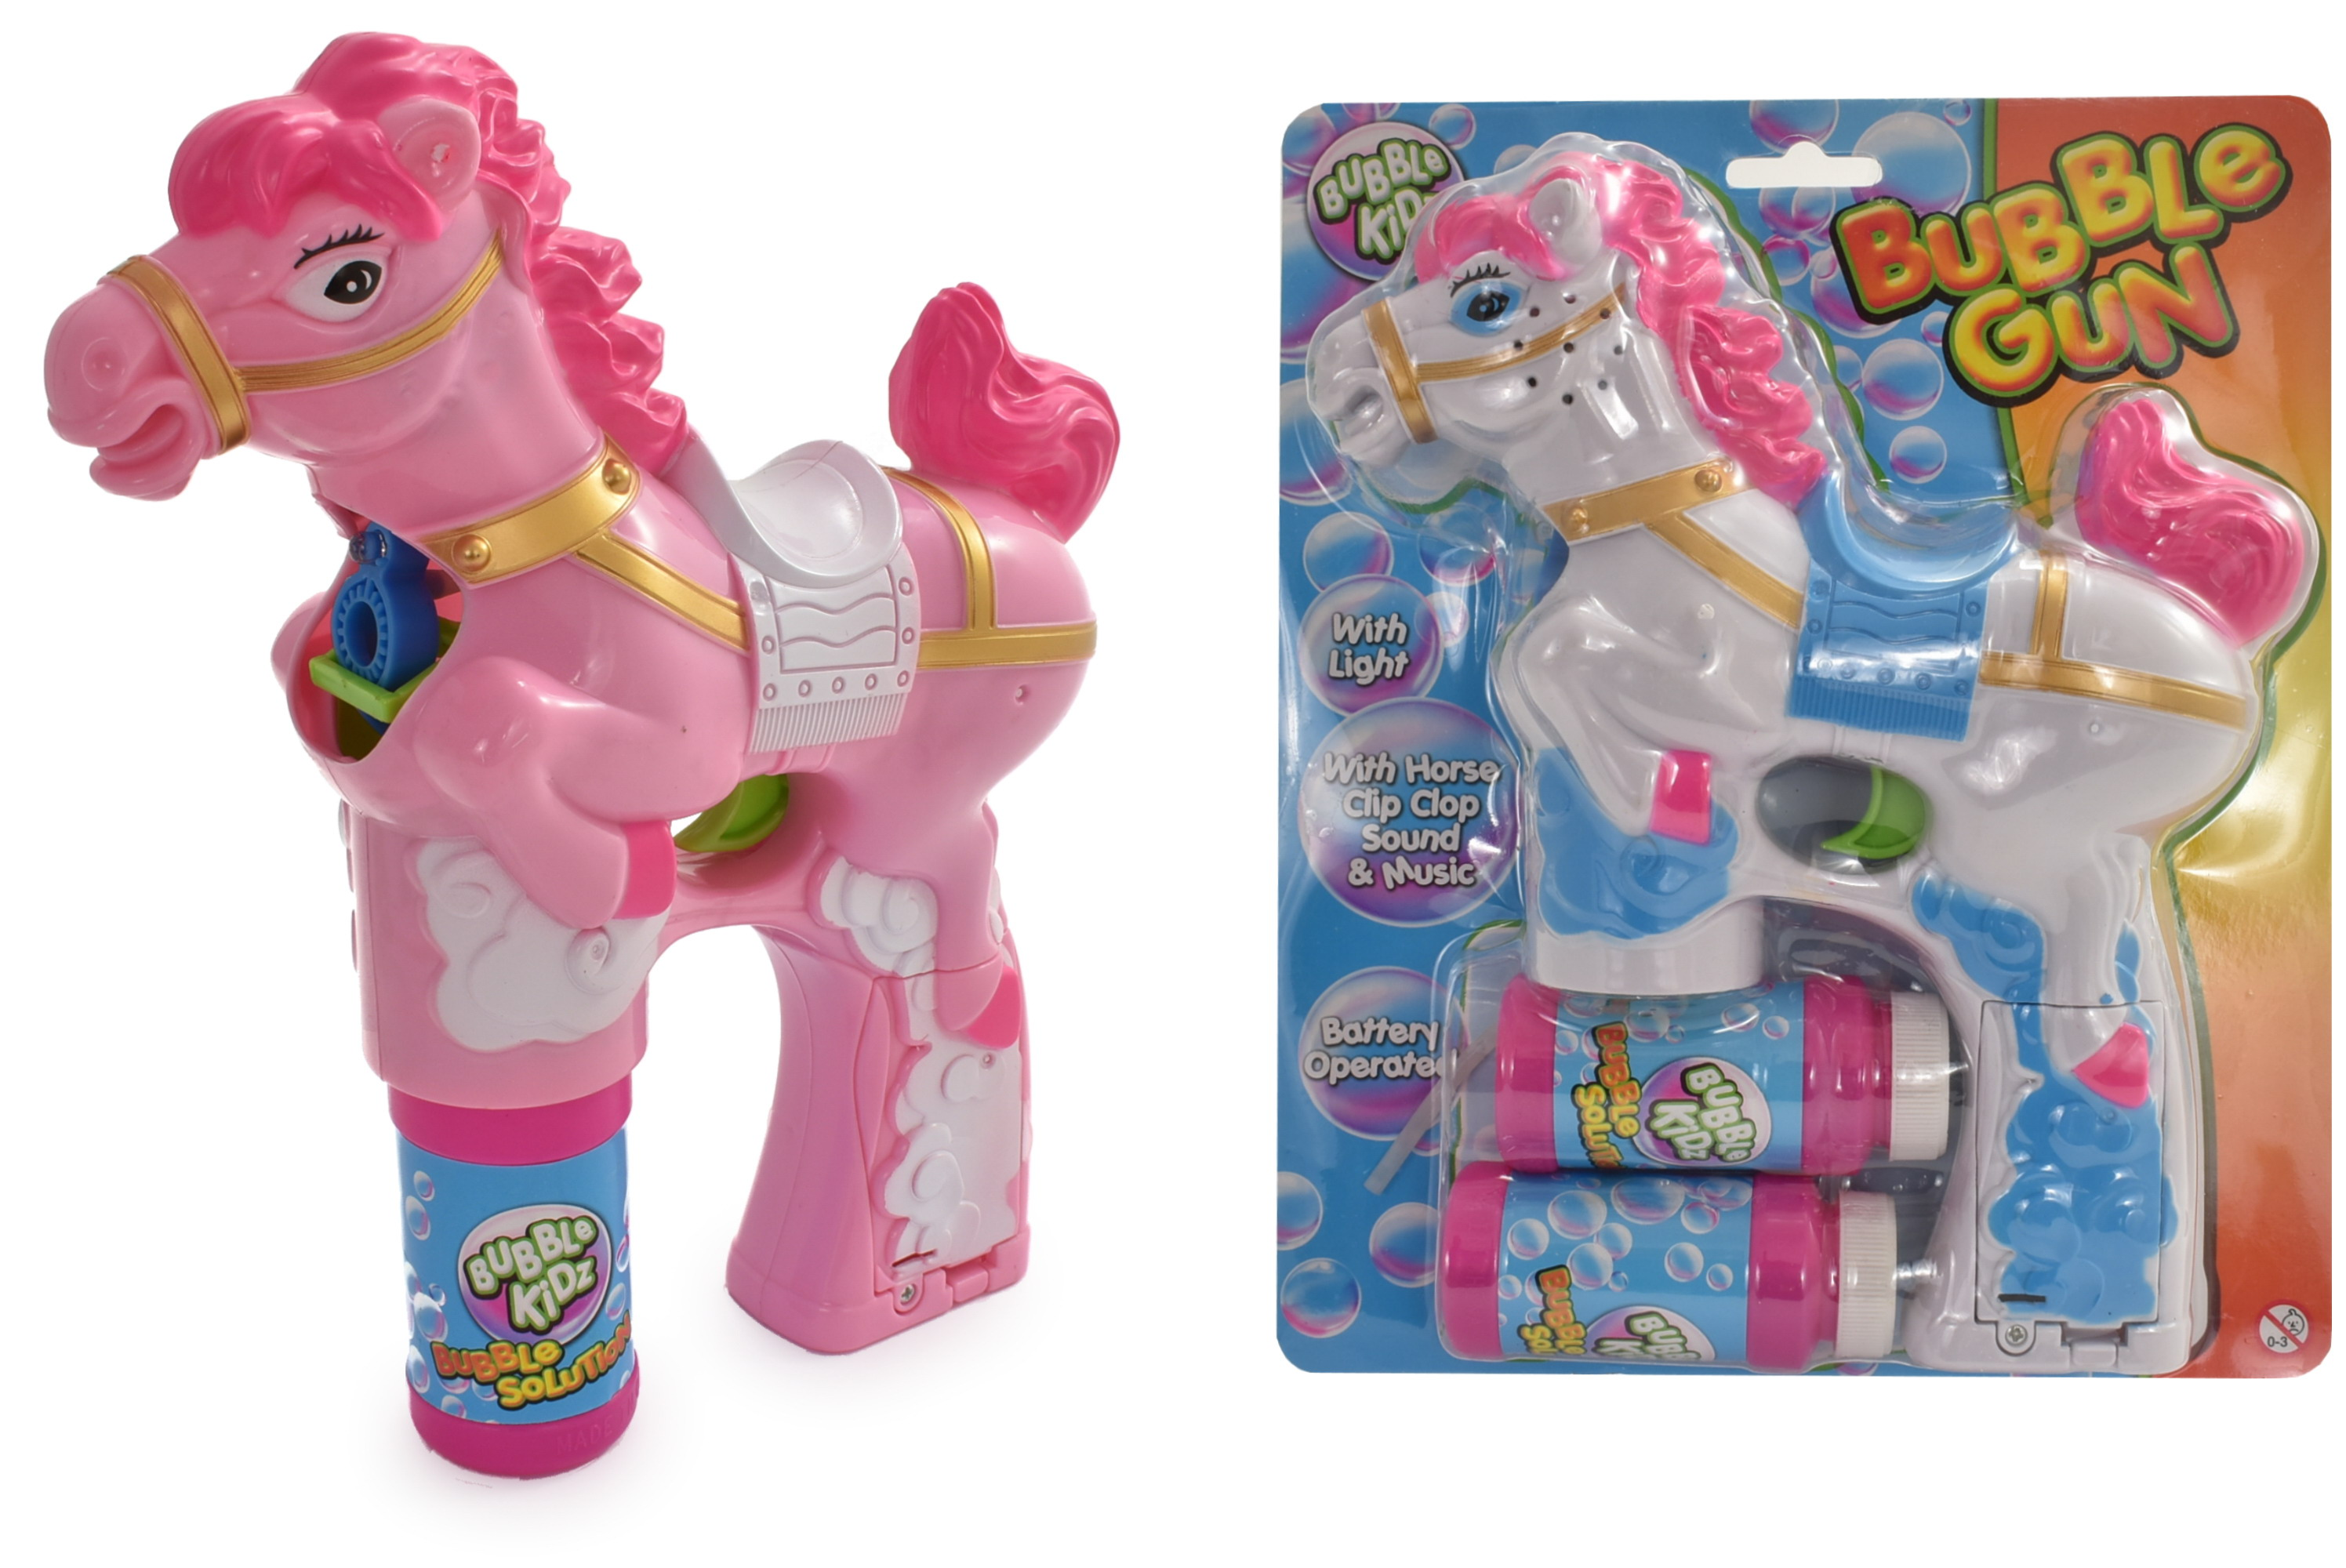 Horse Bubble Gun (2 Tubs) Light & Sound - White & Pink